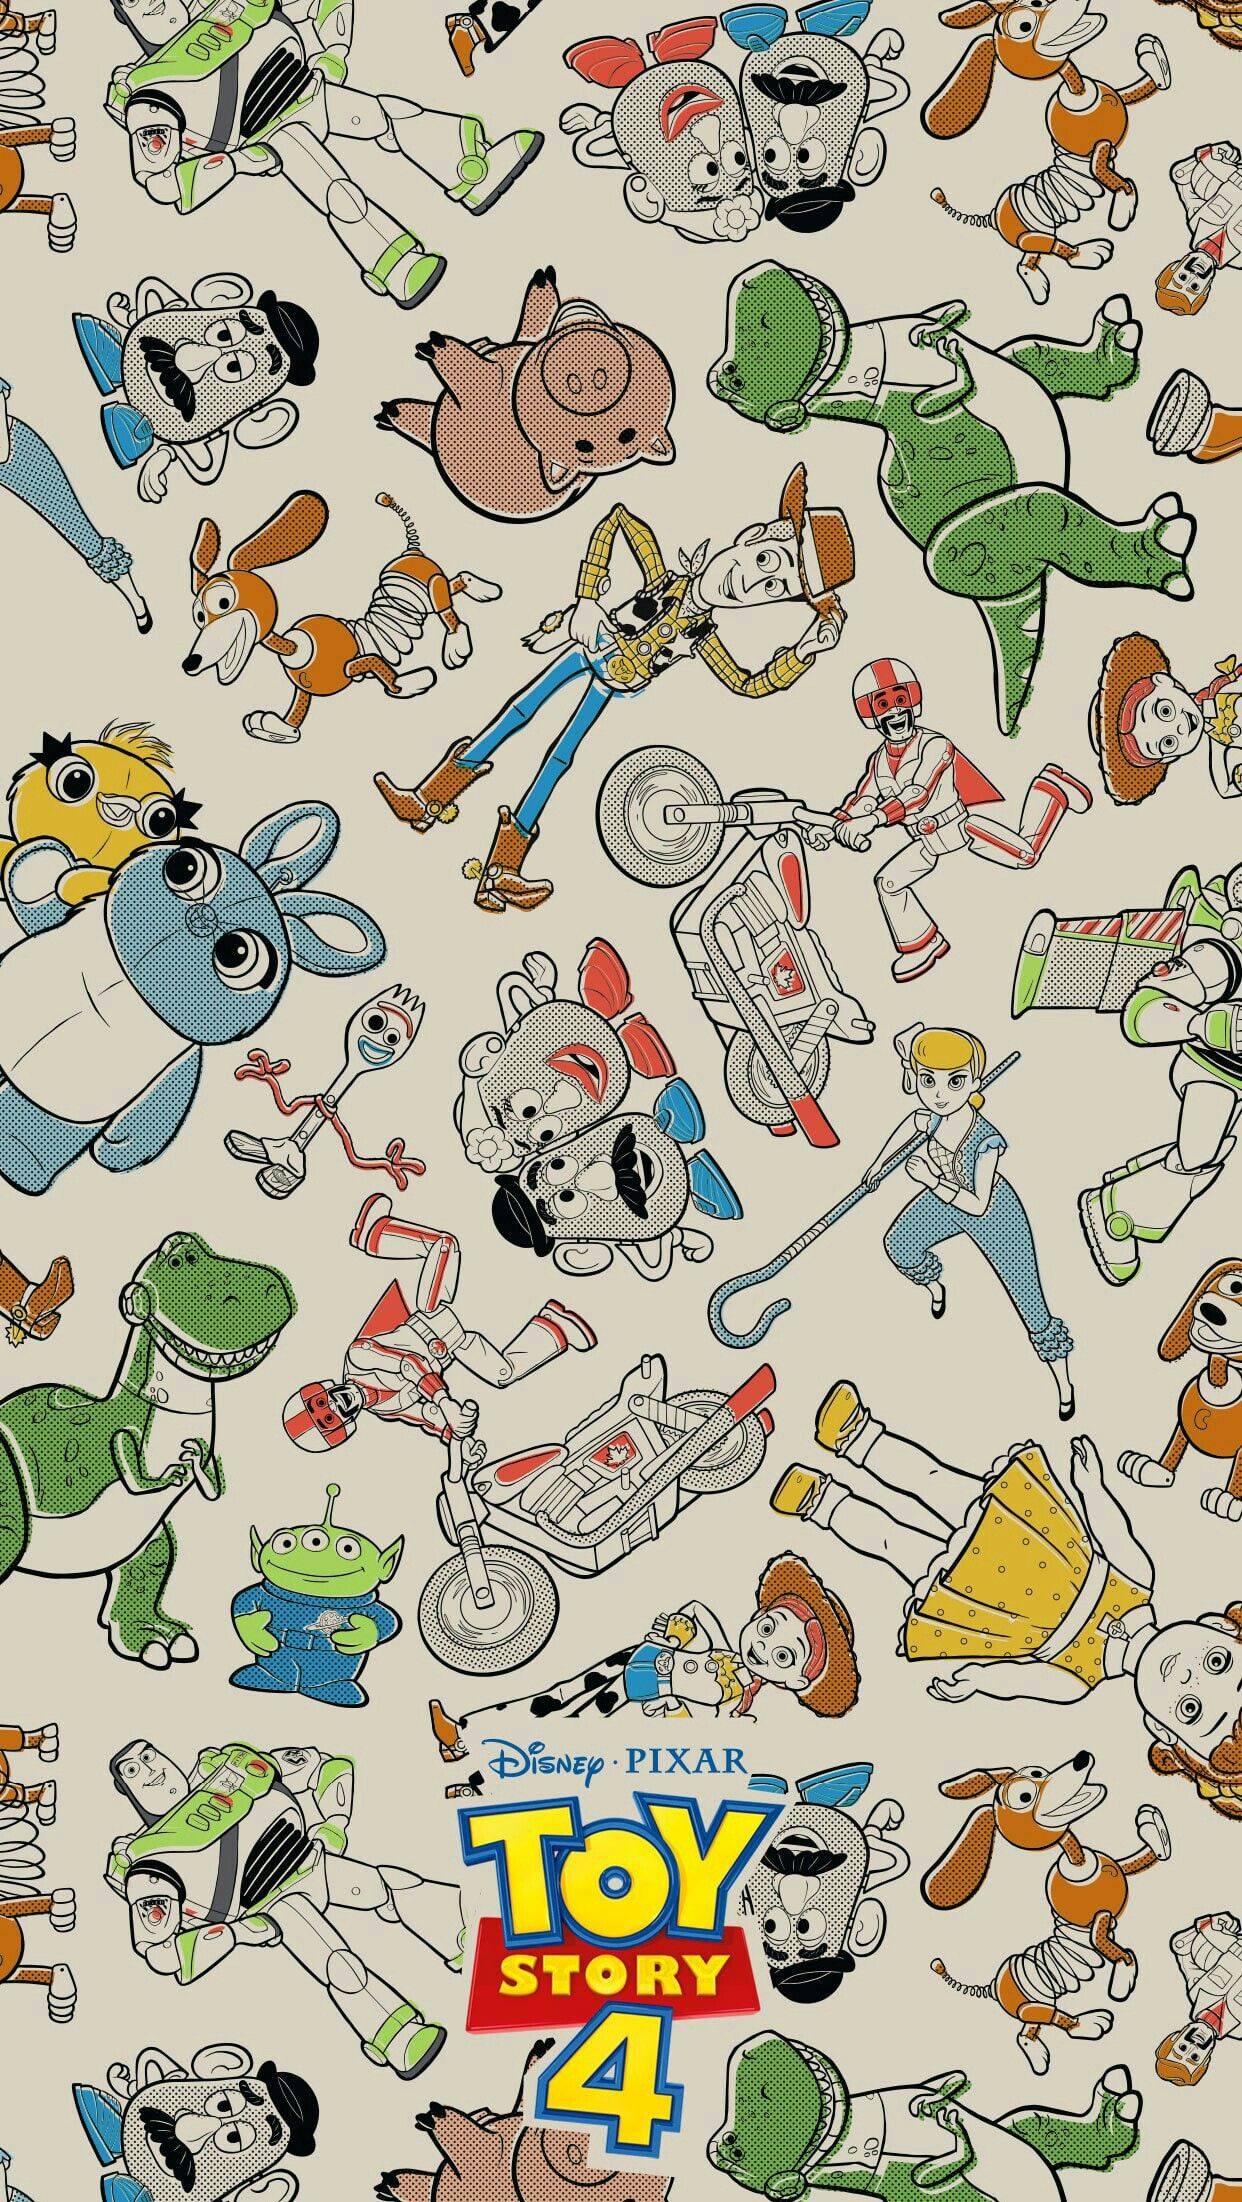 Toy Story 4 In 2019 Wallpaper Iphone Disney Disney Wallpaper